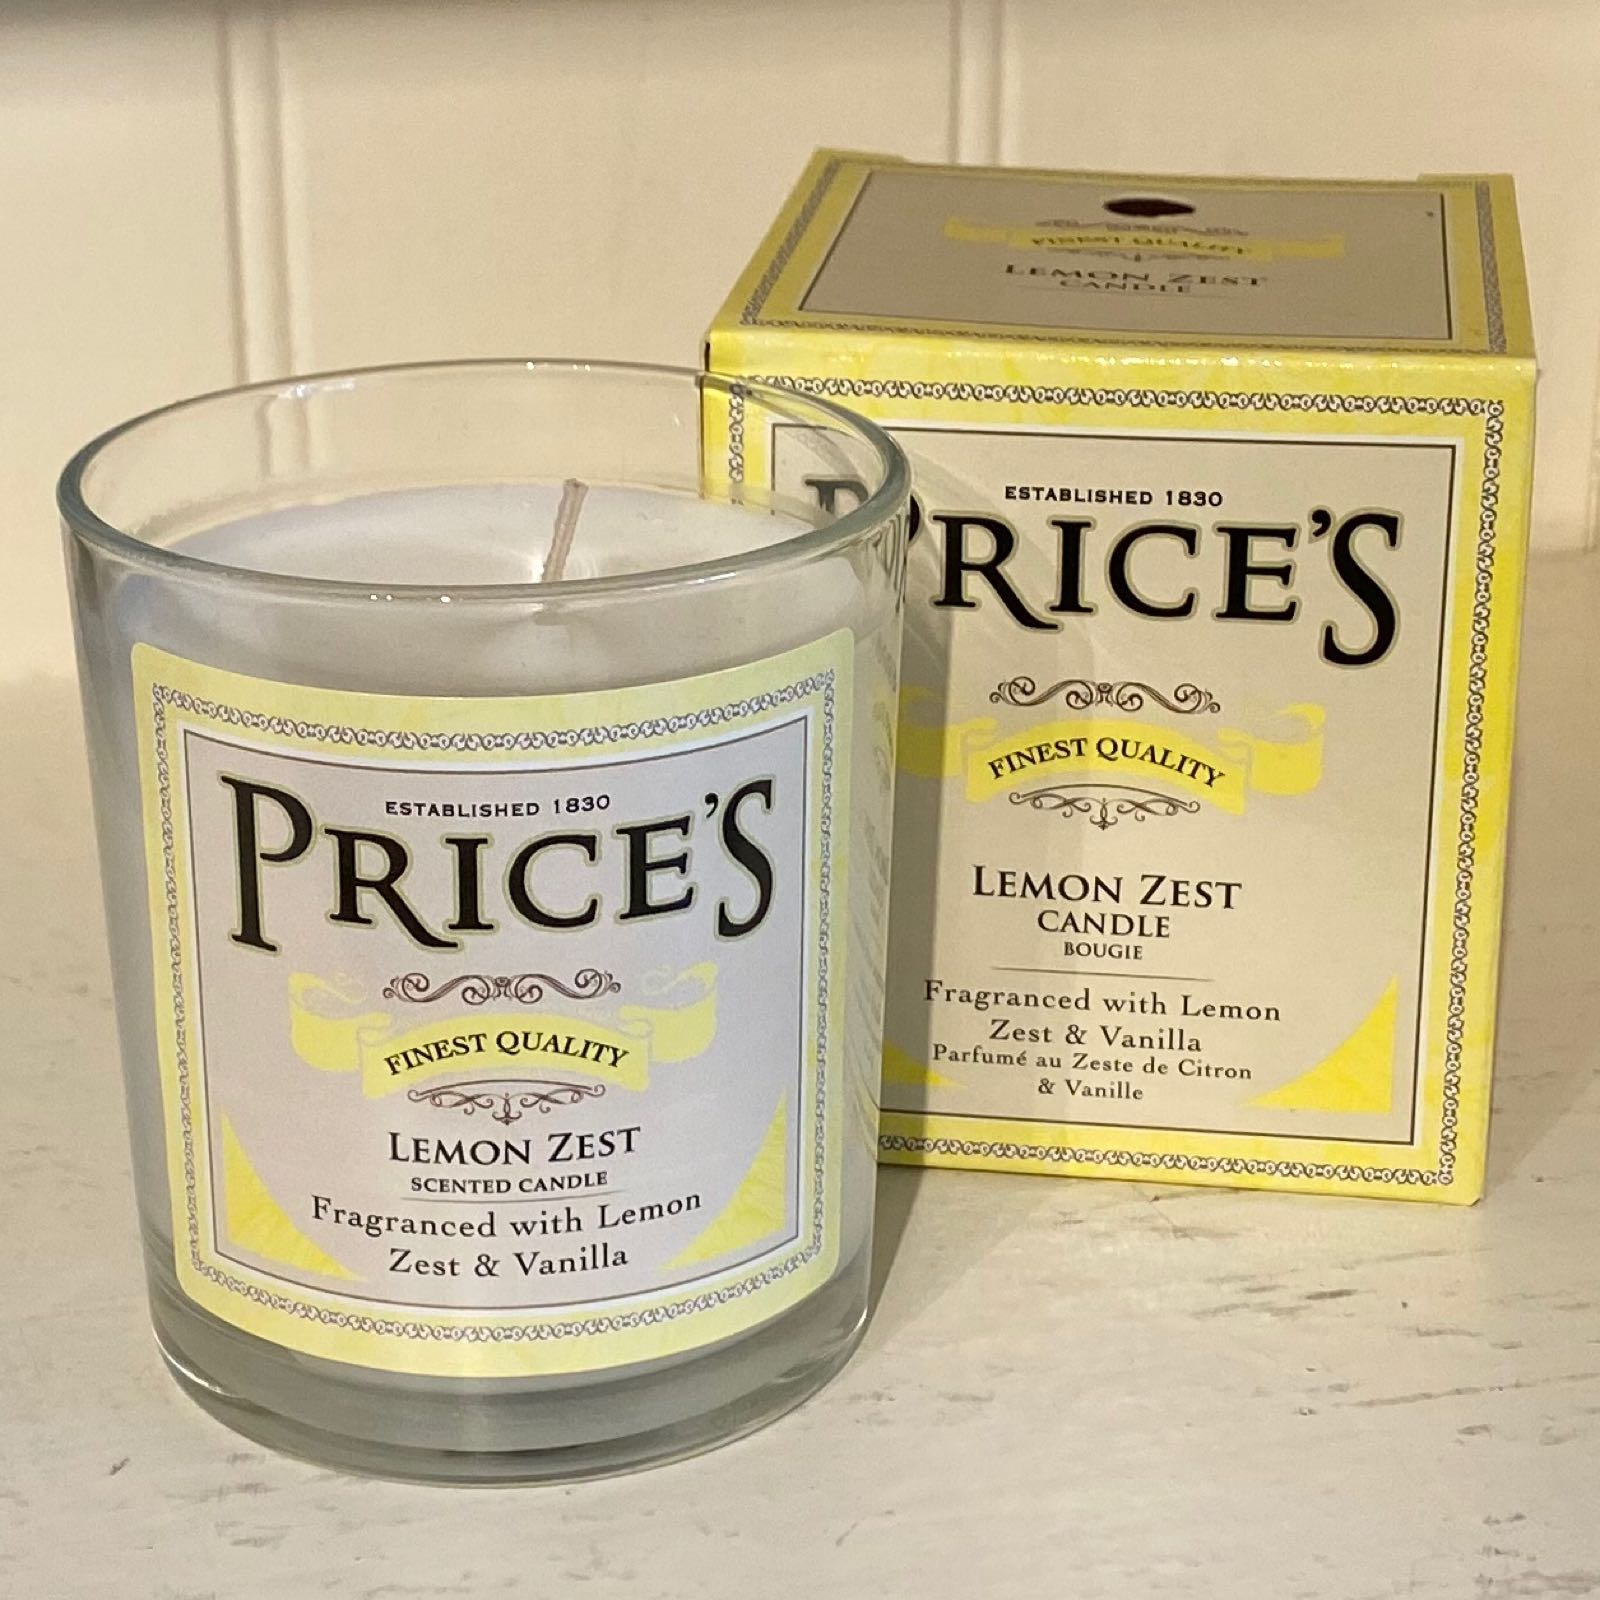 Lemon Zest Heritage Candle